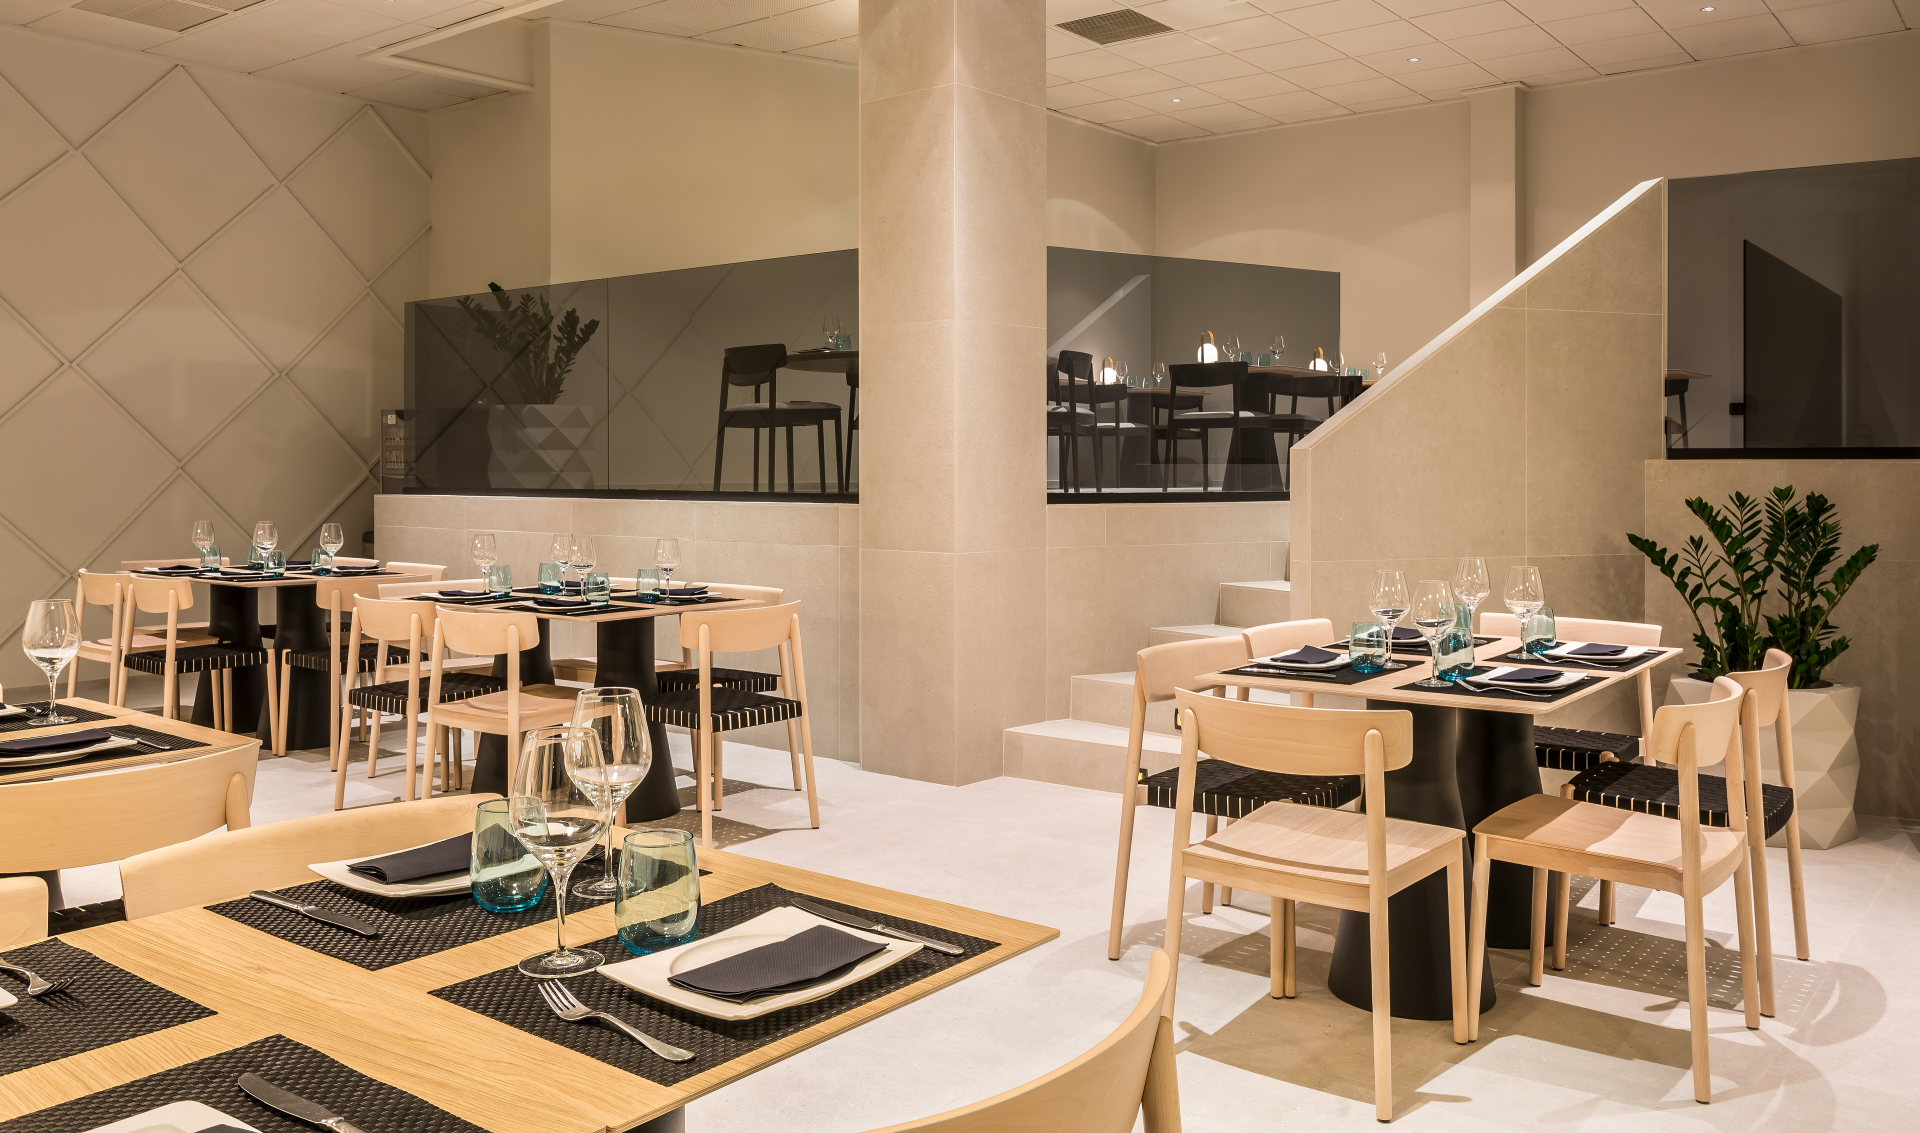 fotografia-arquitectura–interiorismo-valencia-german-cabo-estudihac-restaurante-tipics-xativa (17)